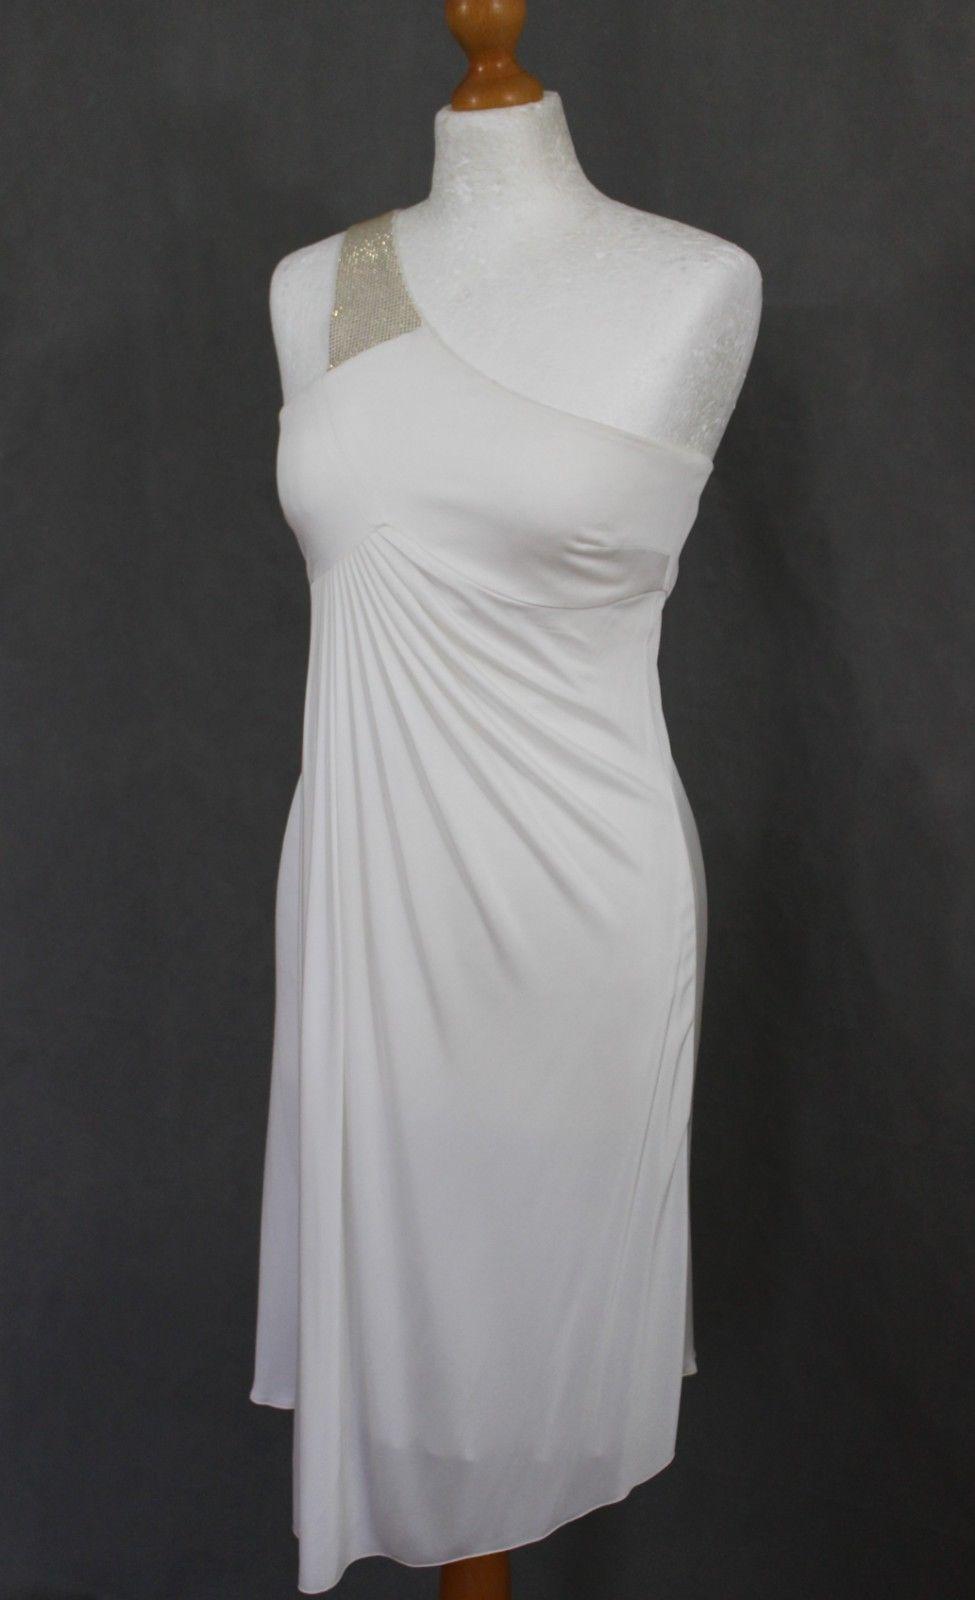 523f1165 52.35 | VERSUS from VERSACE Ladies Single Shoulder White DRESS - Size IT 42  -